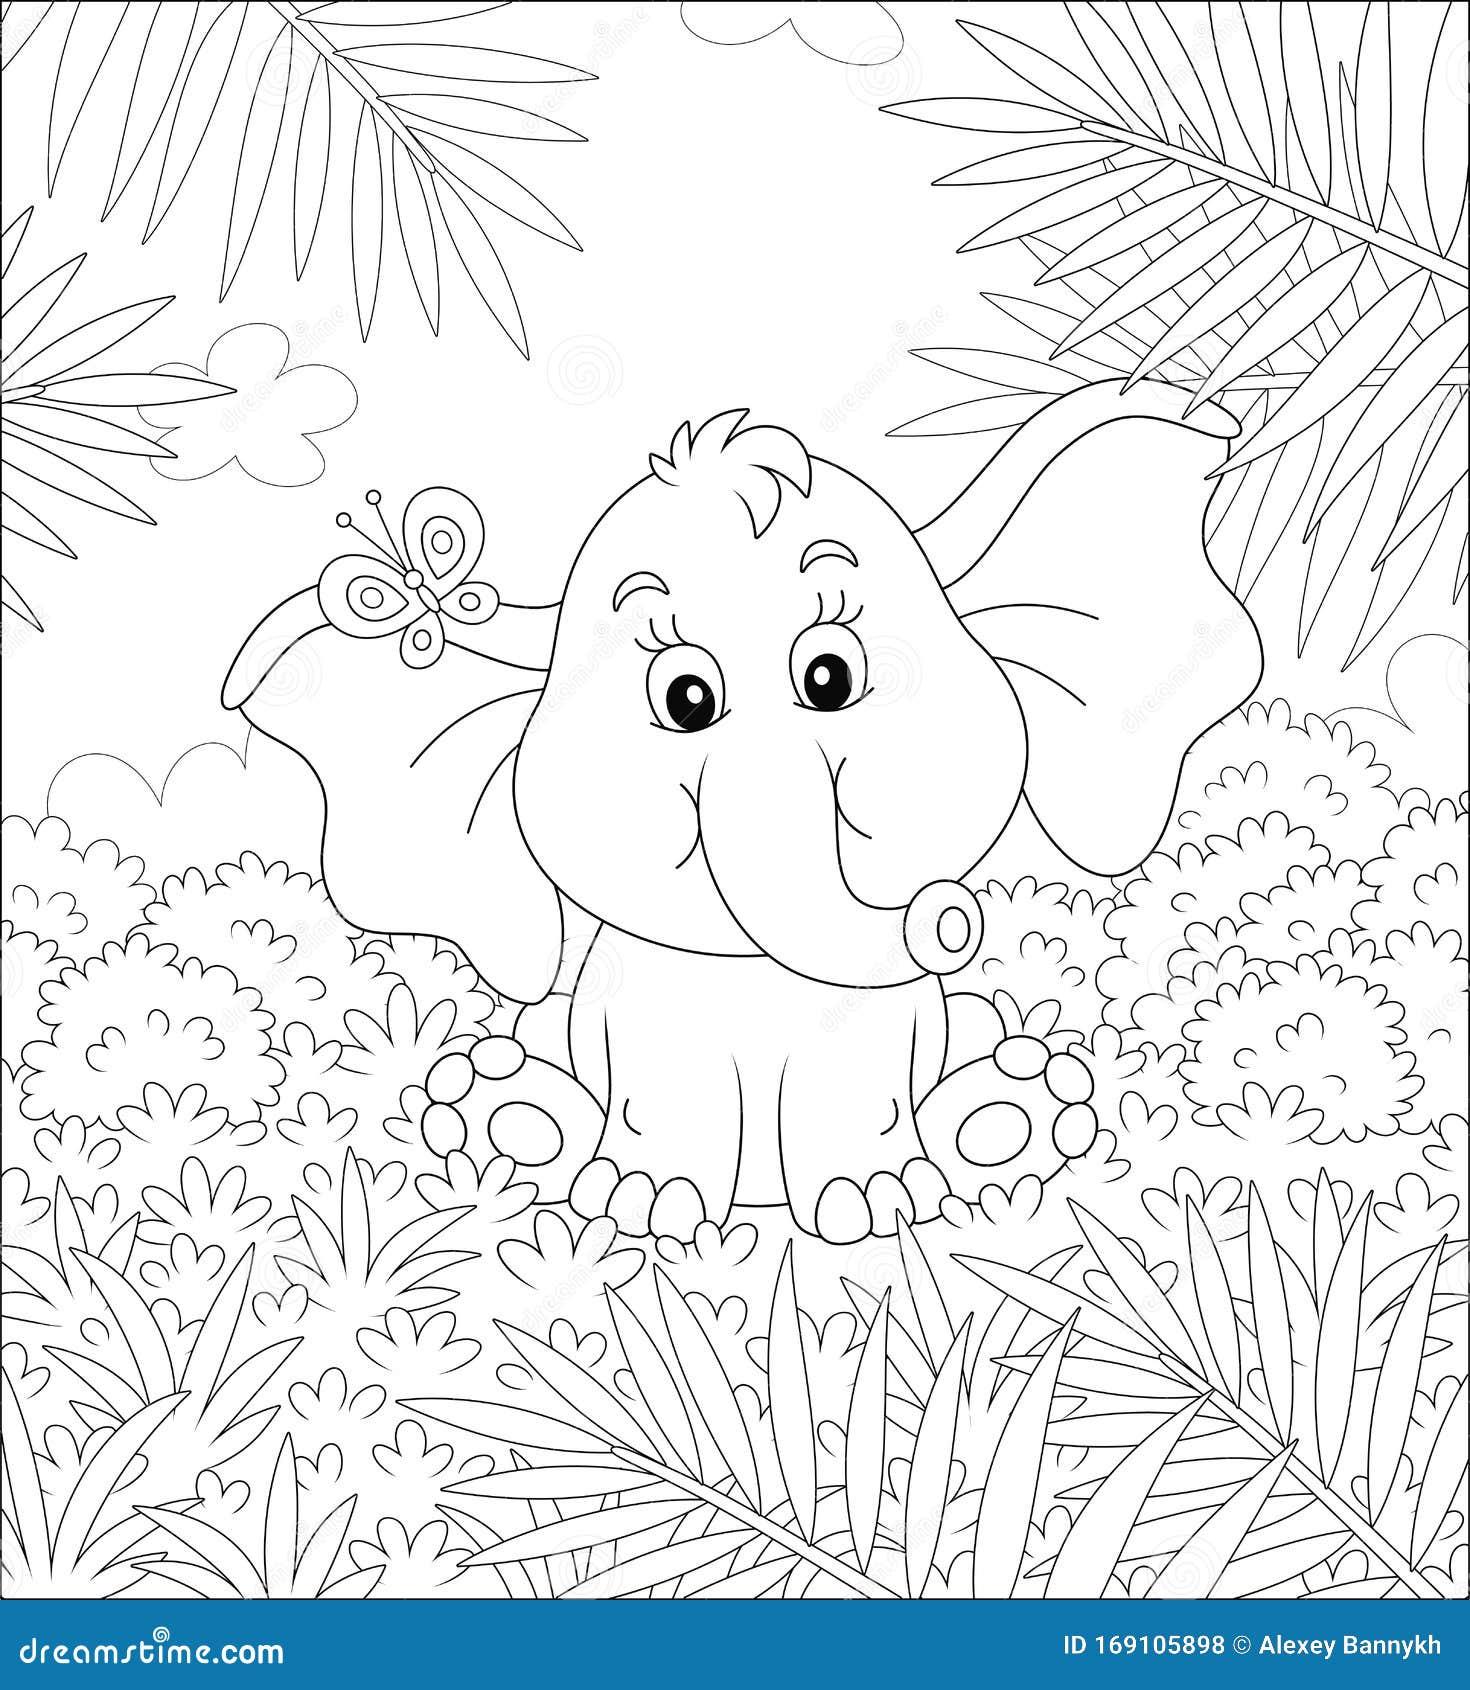 Savanna Coloring Stock Illustrations 928 Savanna Coloring Stock Illustrations Vectors Clipart Dreamstime